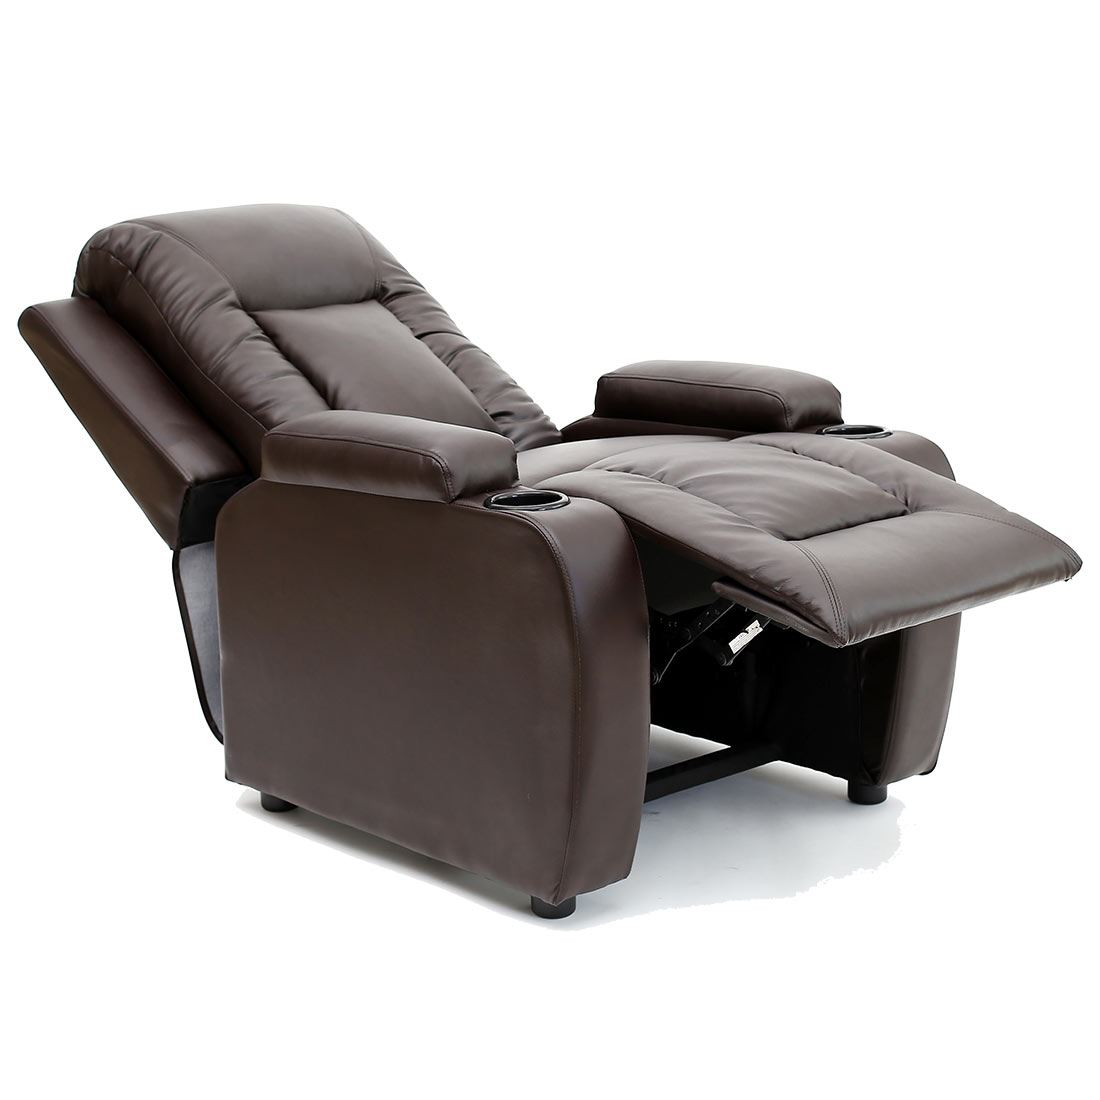 sofa armchair drink holder caddy full size flip oscar leather recliner w holders chair